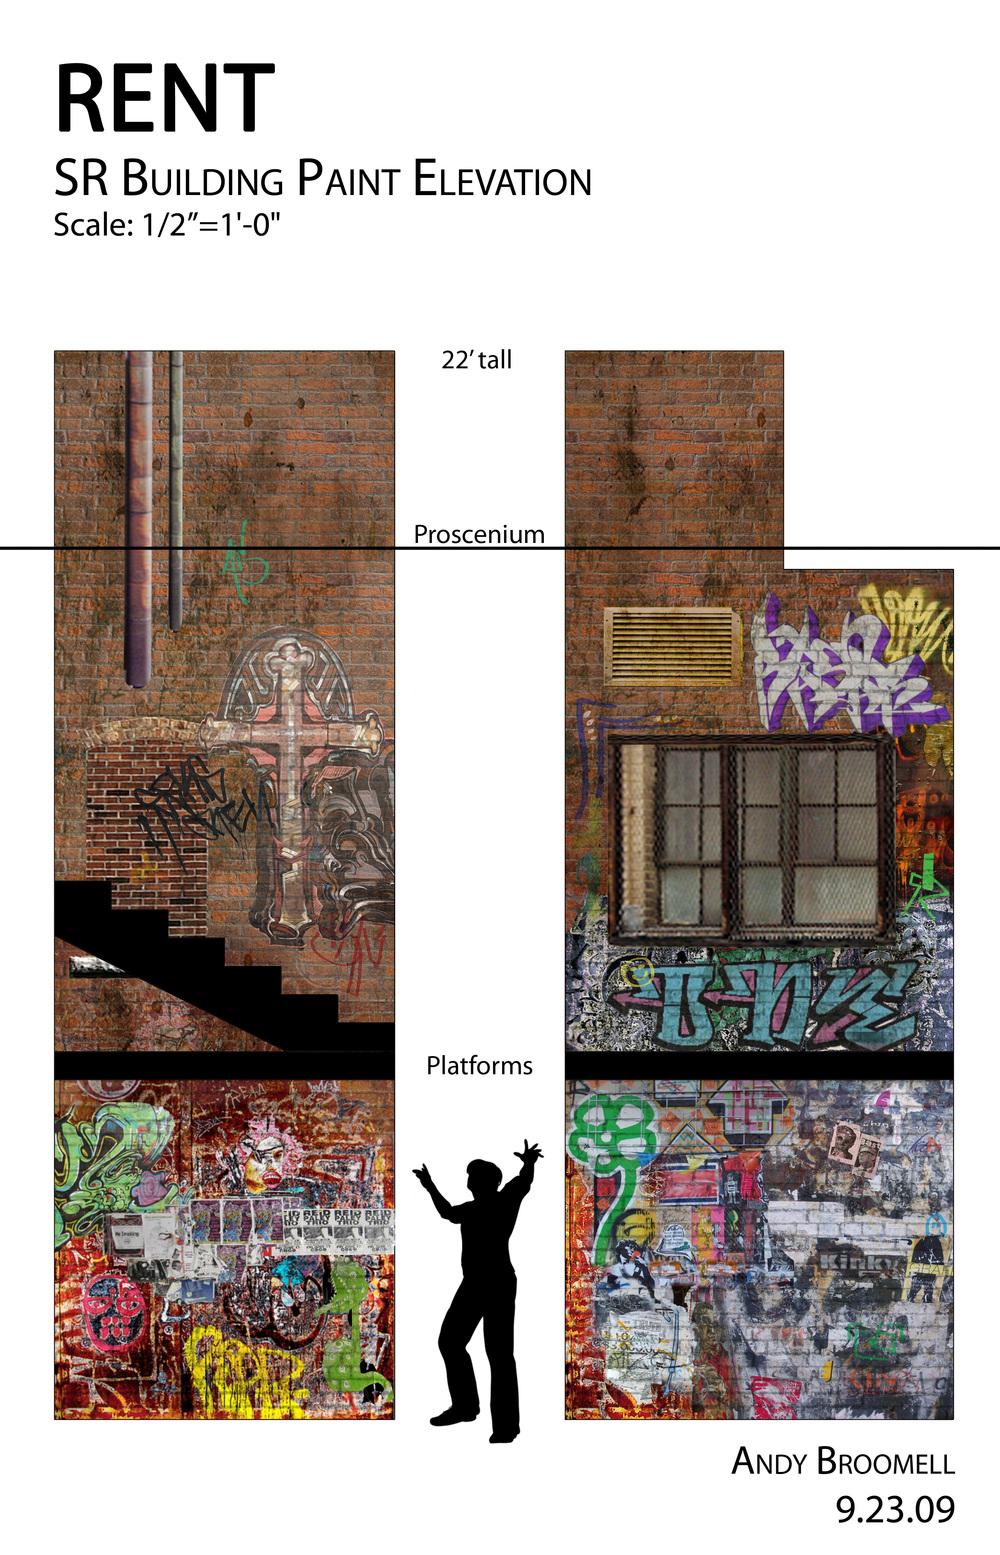 SR-building-frontel-5-final-website-dec2013.jpg